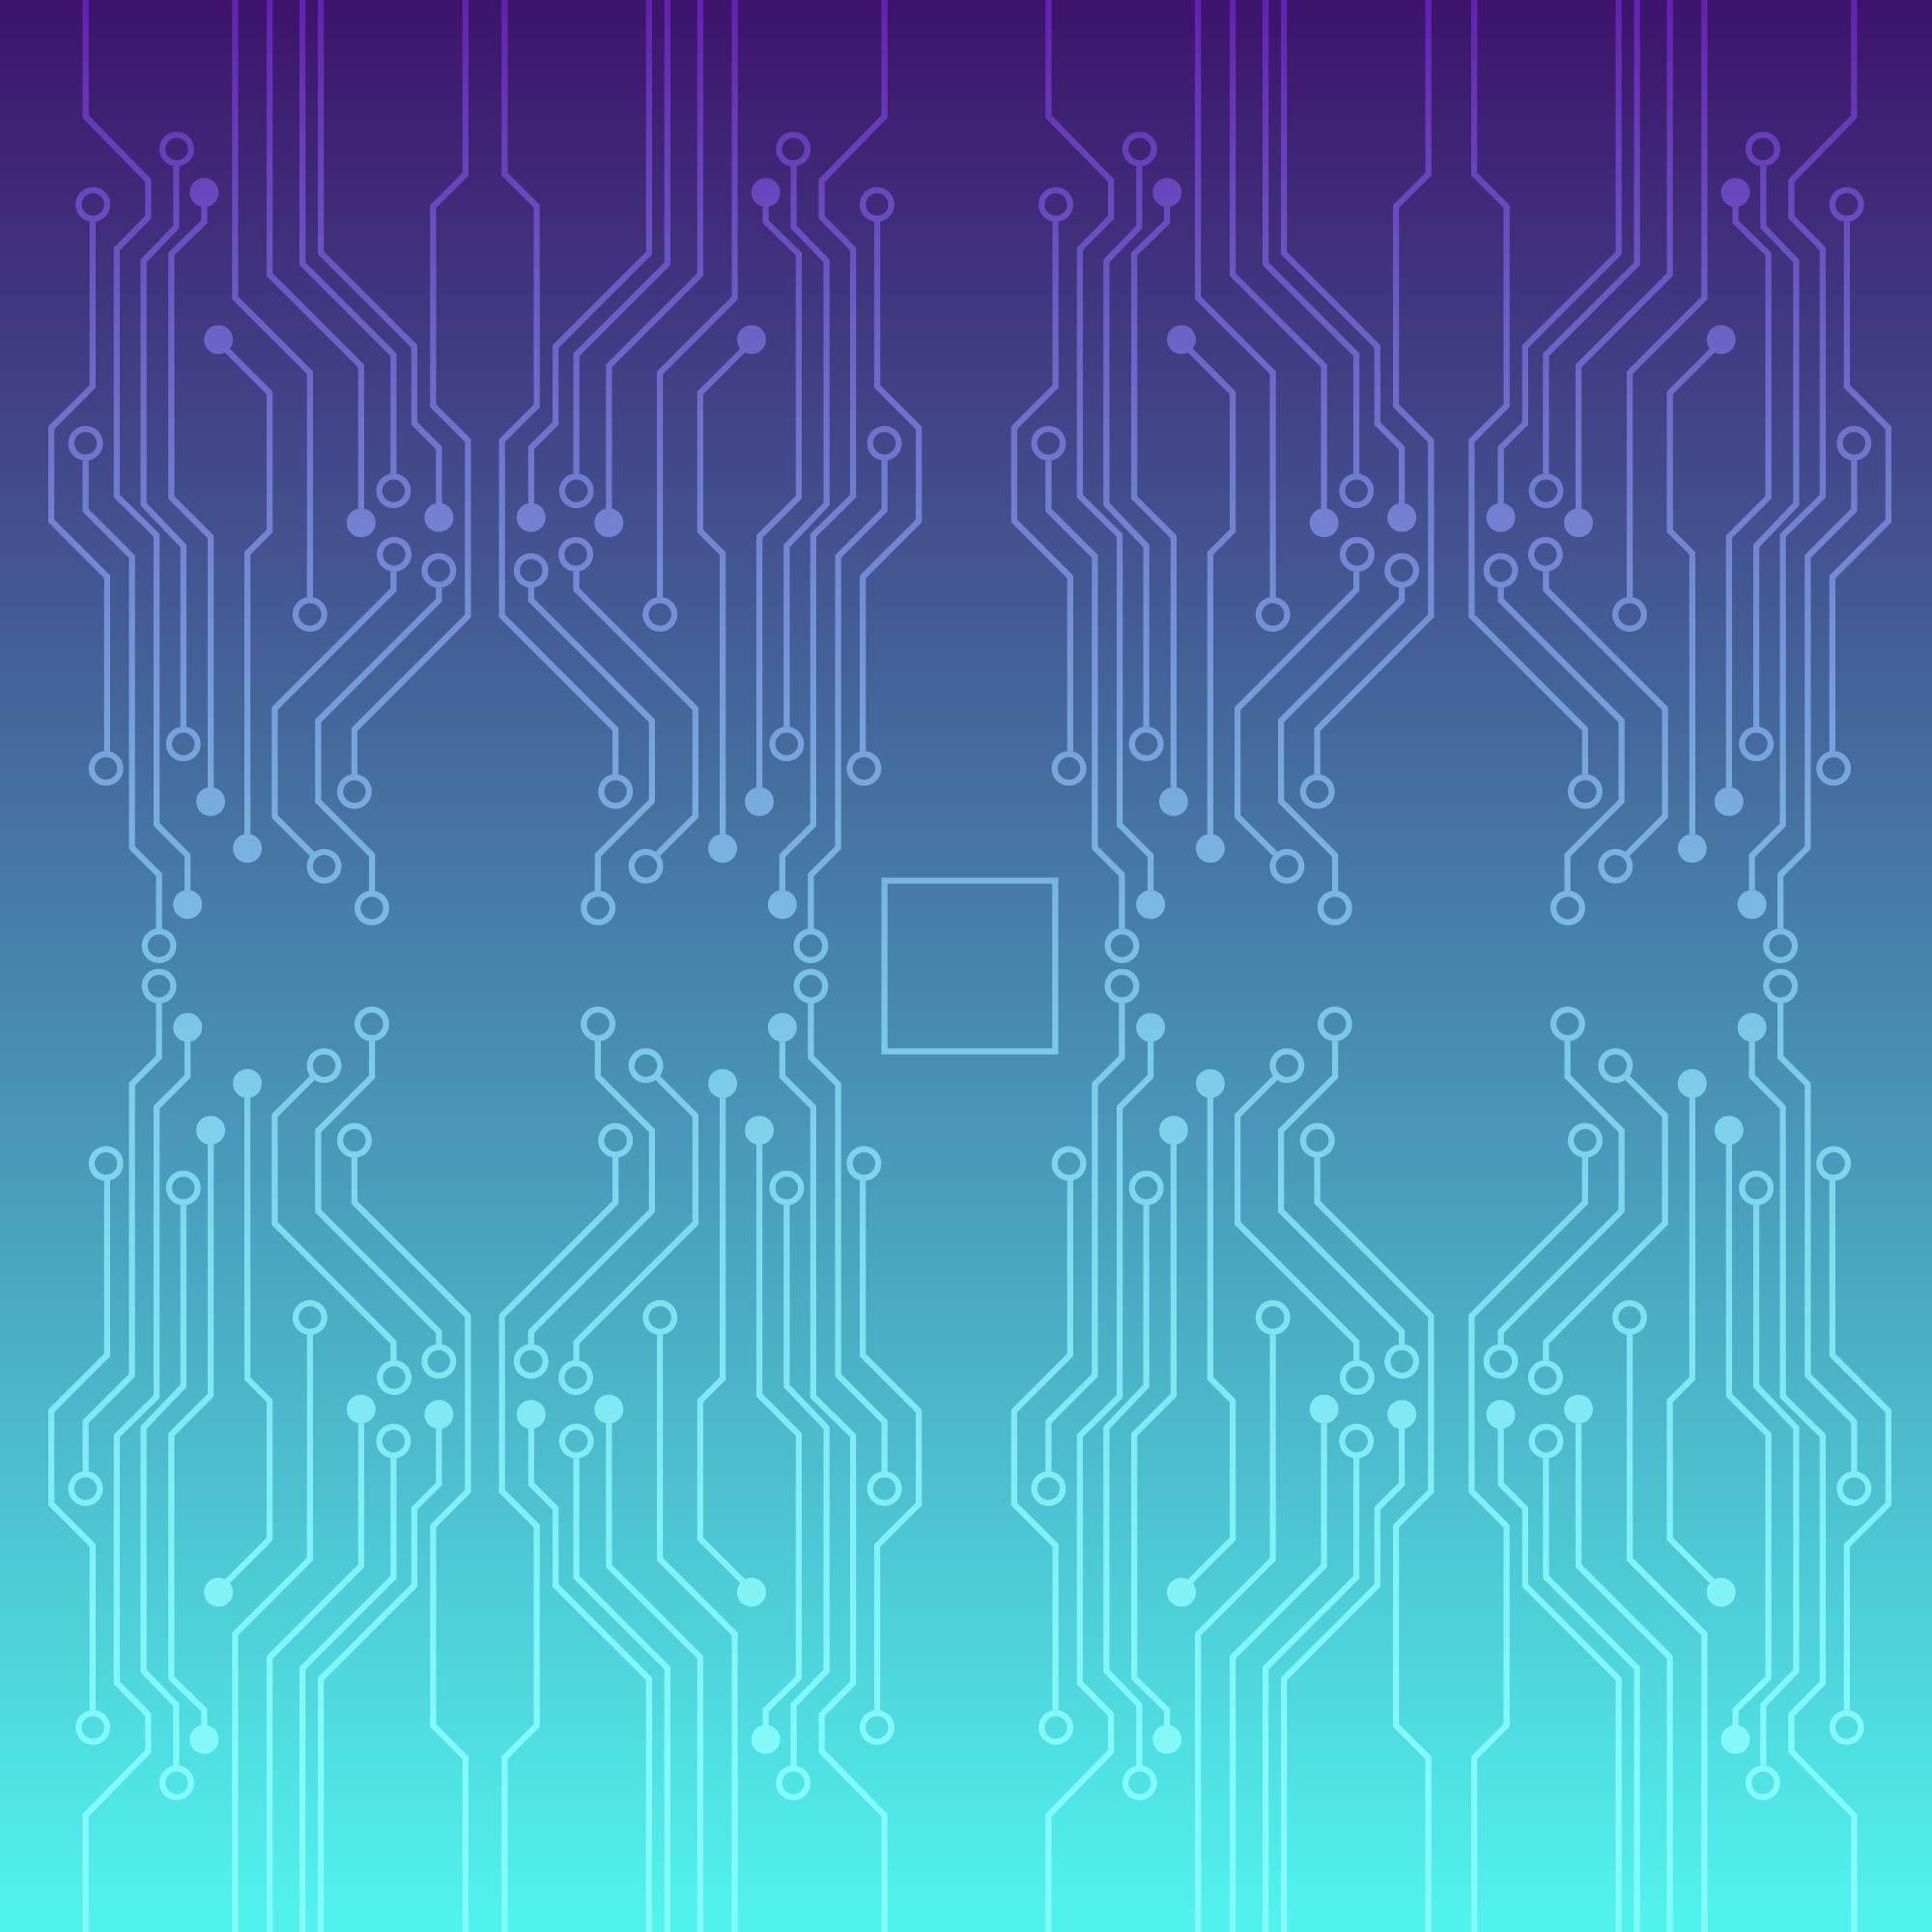 Printed Circuit Board Vector Download Free Vector Art